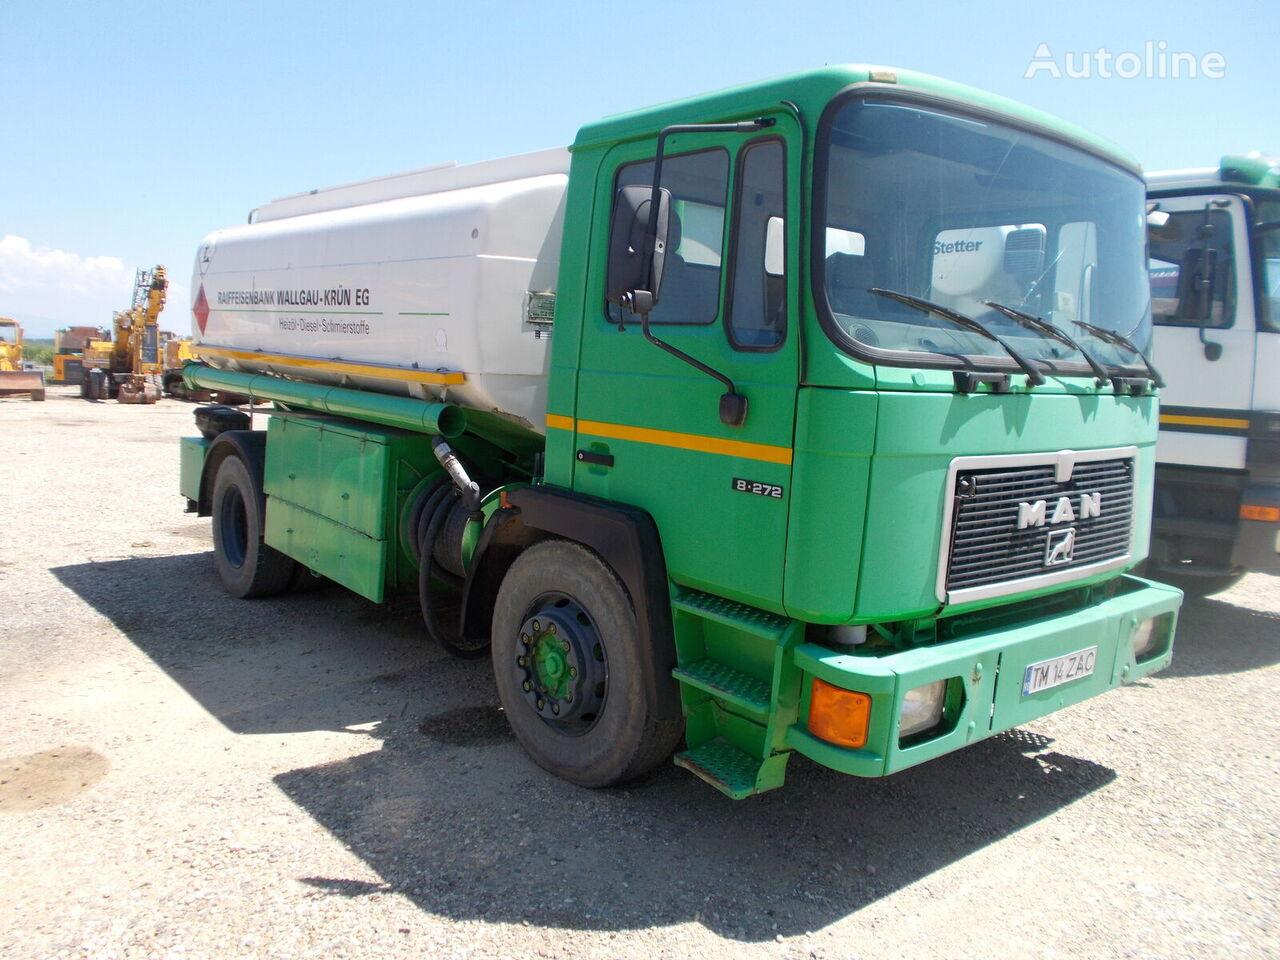 MAN 18272 fuel truck